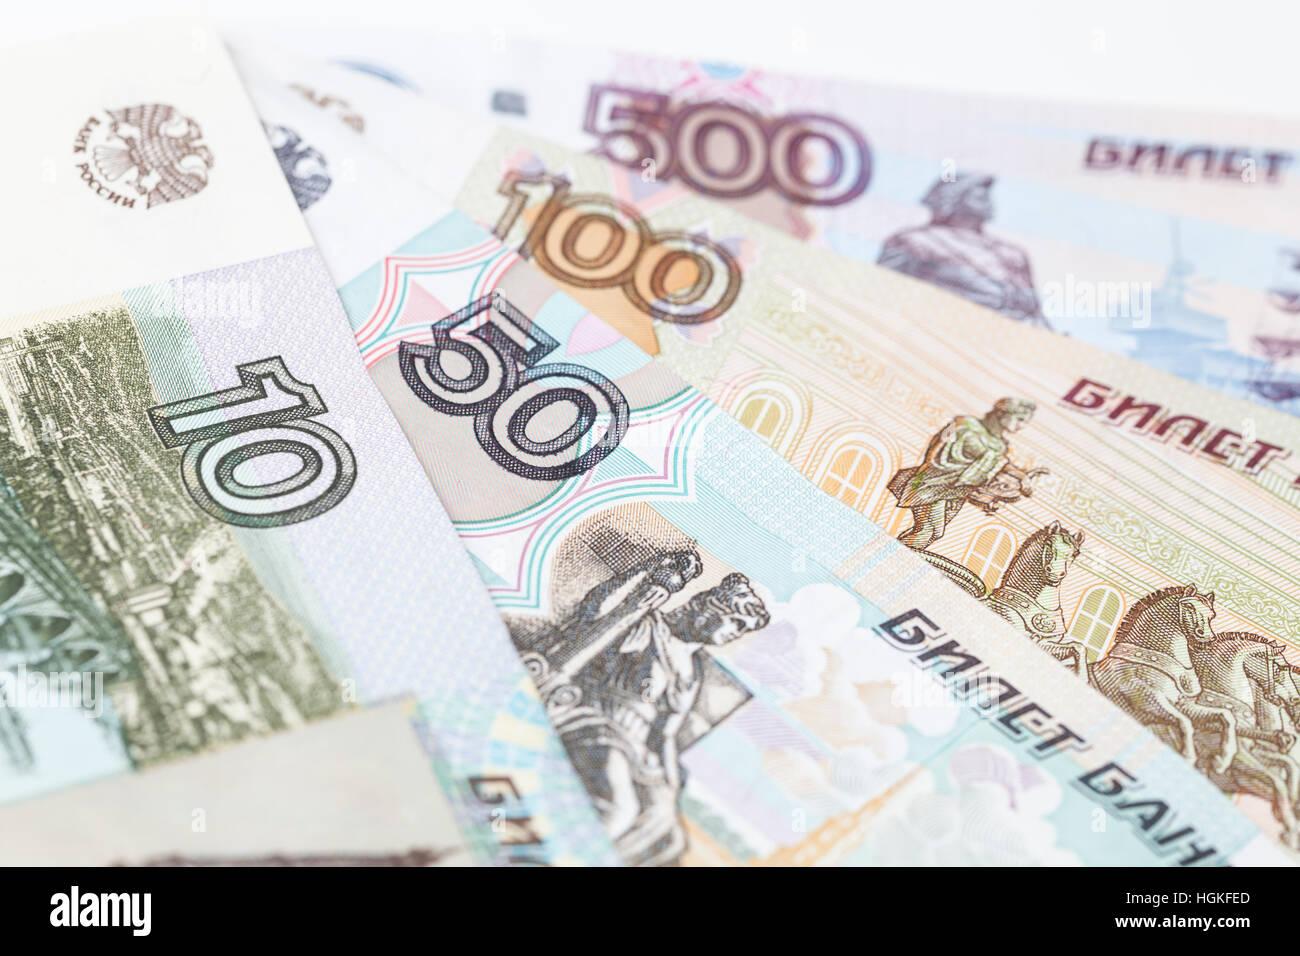 russian ruble stock photo 130736325 alamy